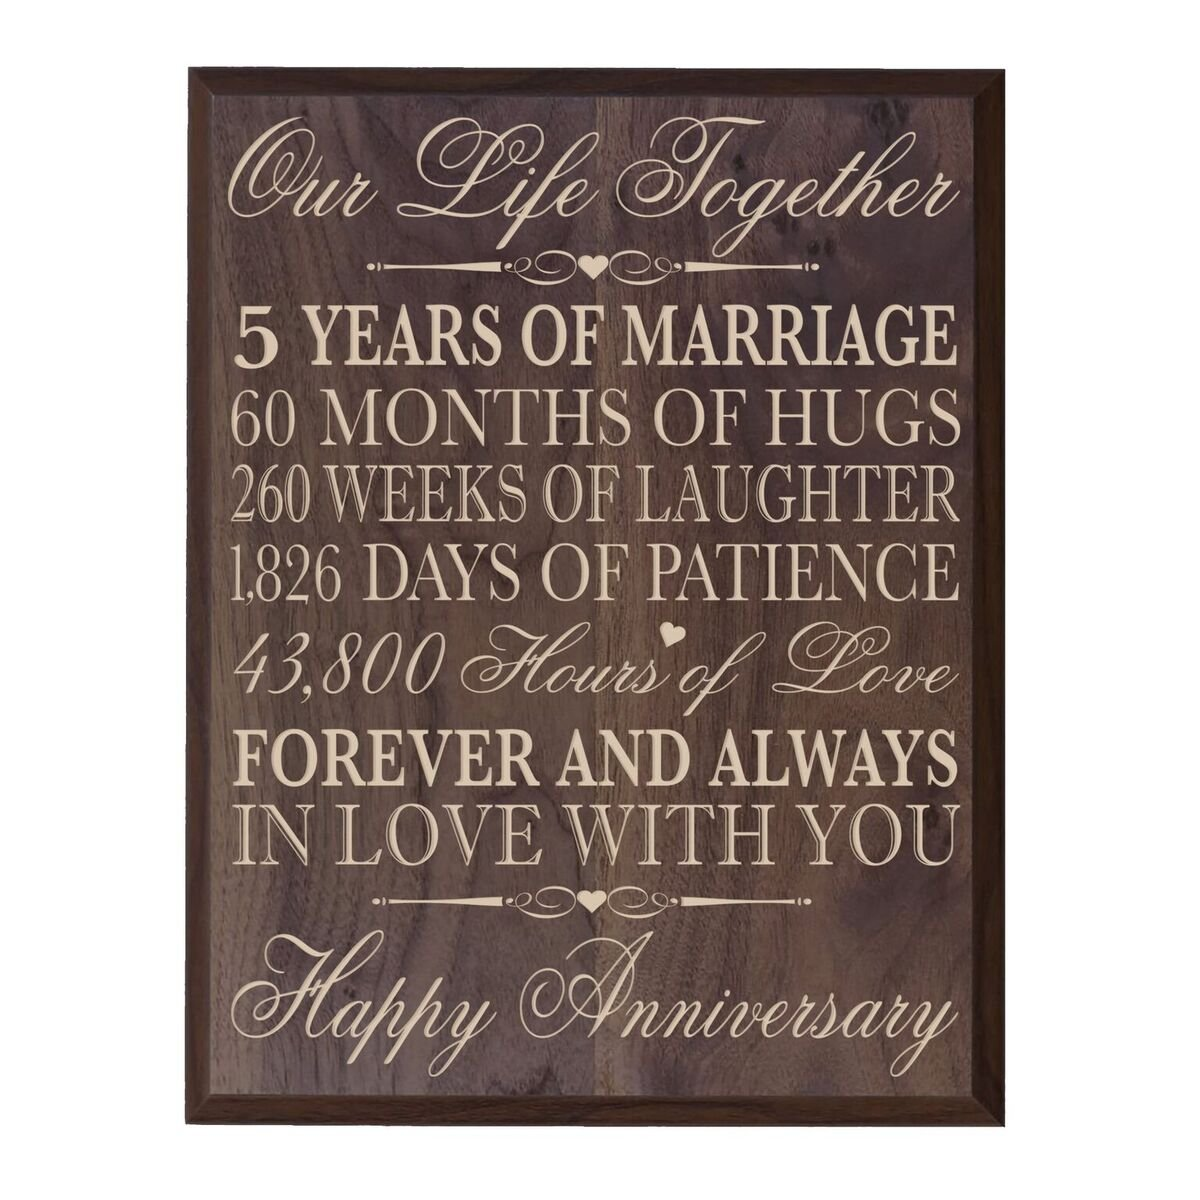 5th Wedding Anniversary Wall Plaque Gifts for Couple, 5th Anniversary Gifts for Her,5th Wedding Anniversary Gifts for Him 10.75'' W X 13'' H Wall Plaque By LifeSong Milestones (Grand Walnut)